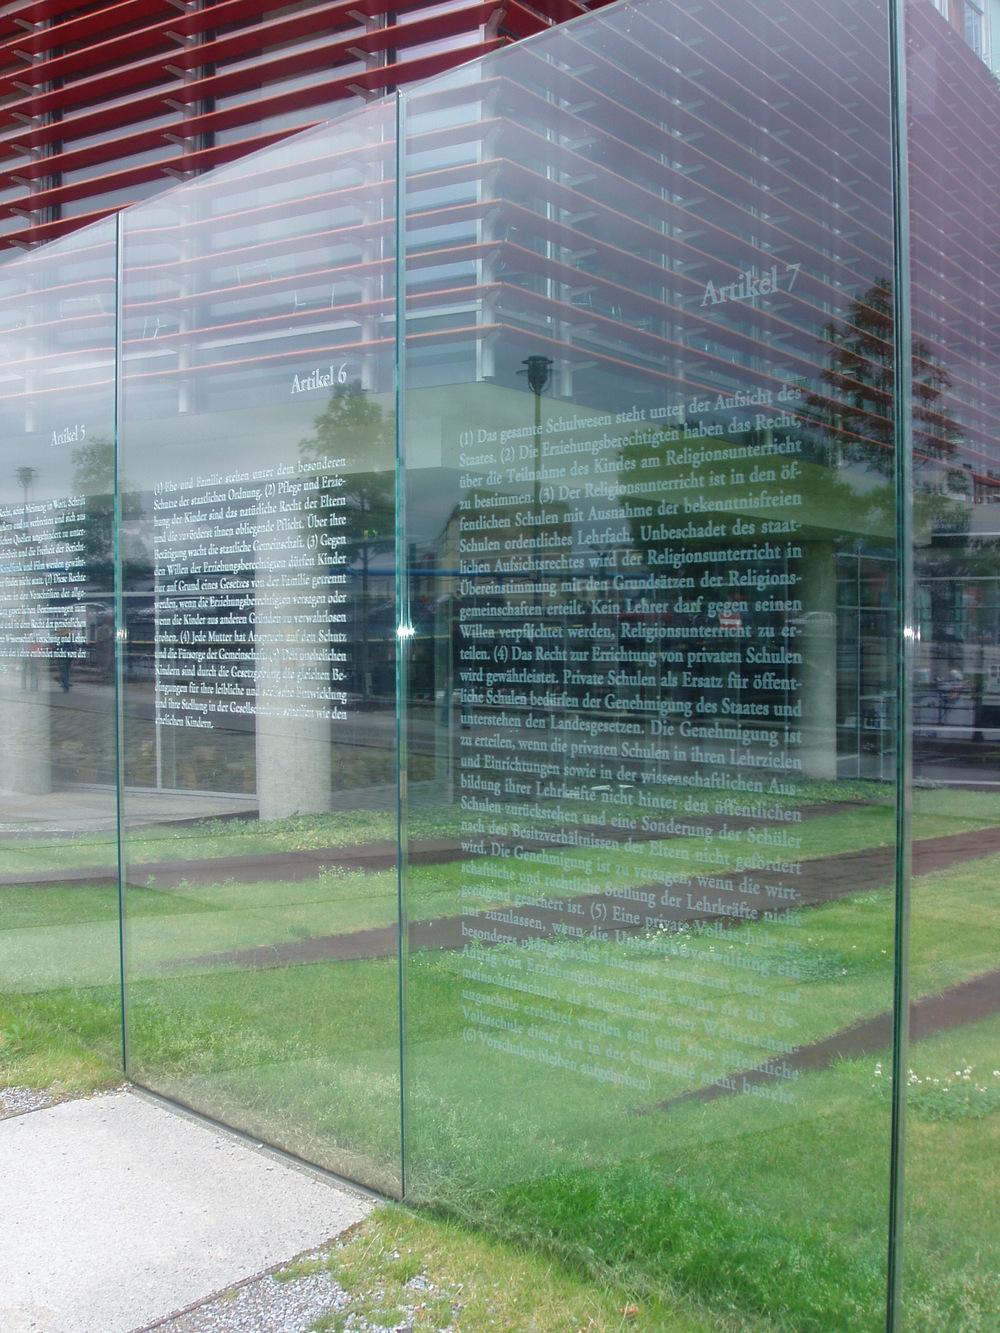 Berlin -Jakob-Kaiser-Haus -Dorotheenstraße 100/101,11017 Berlin,Germany